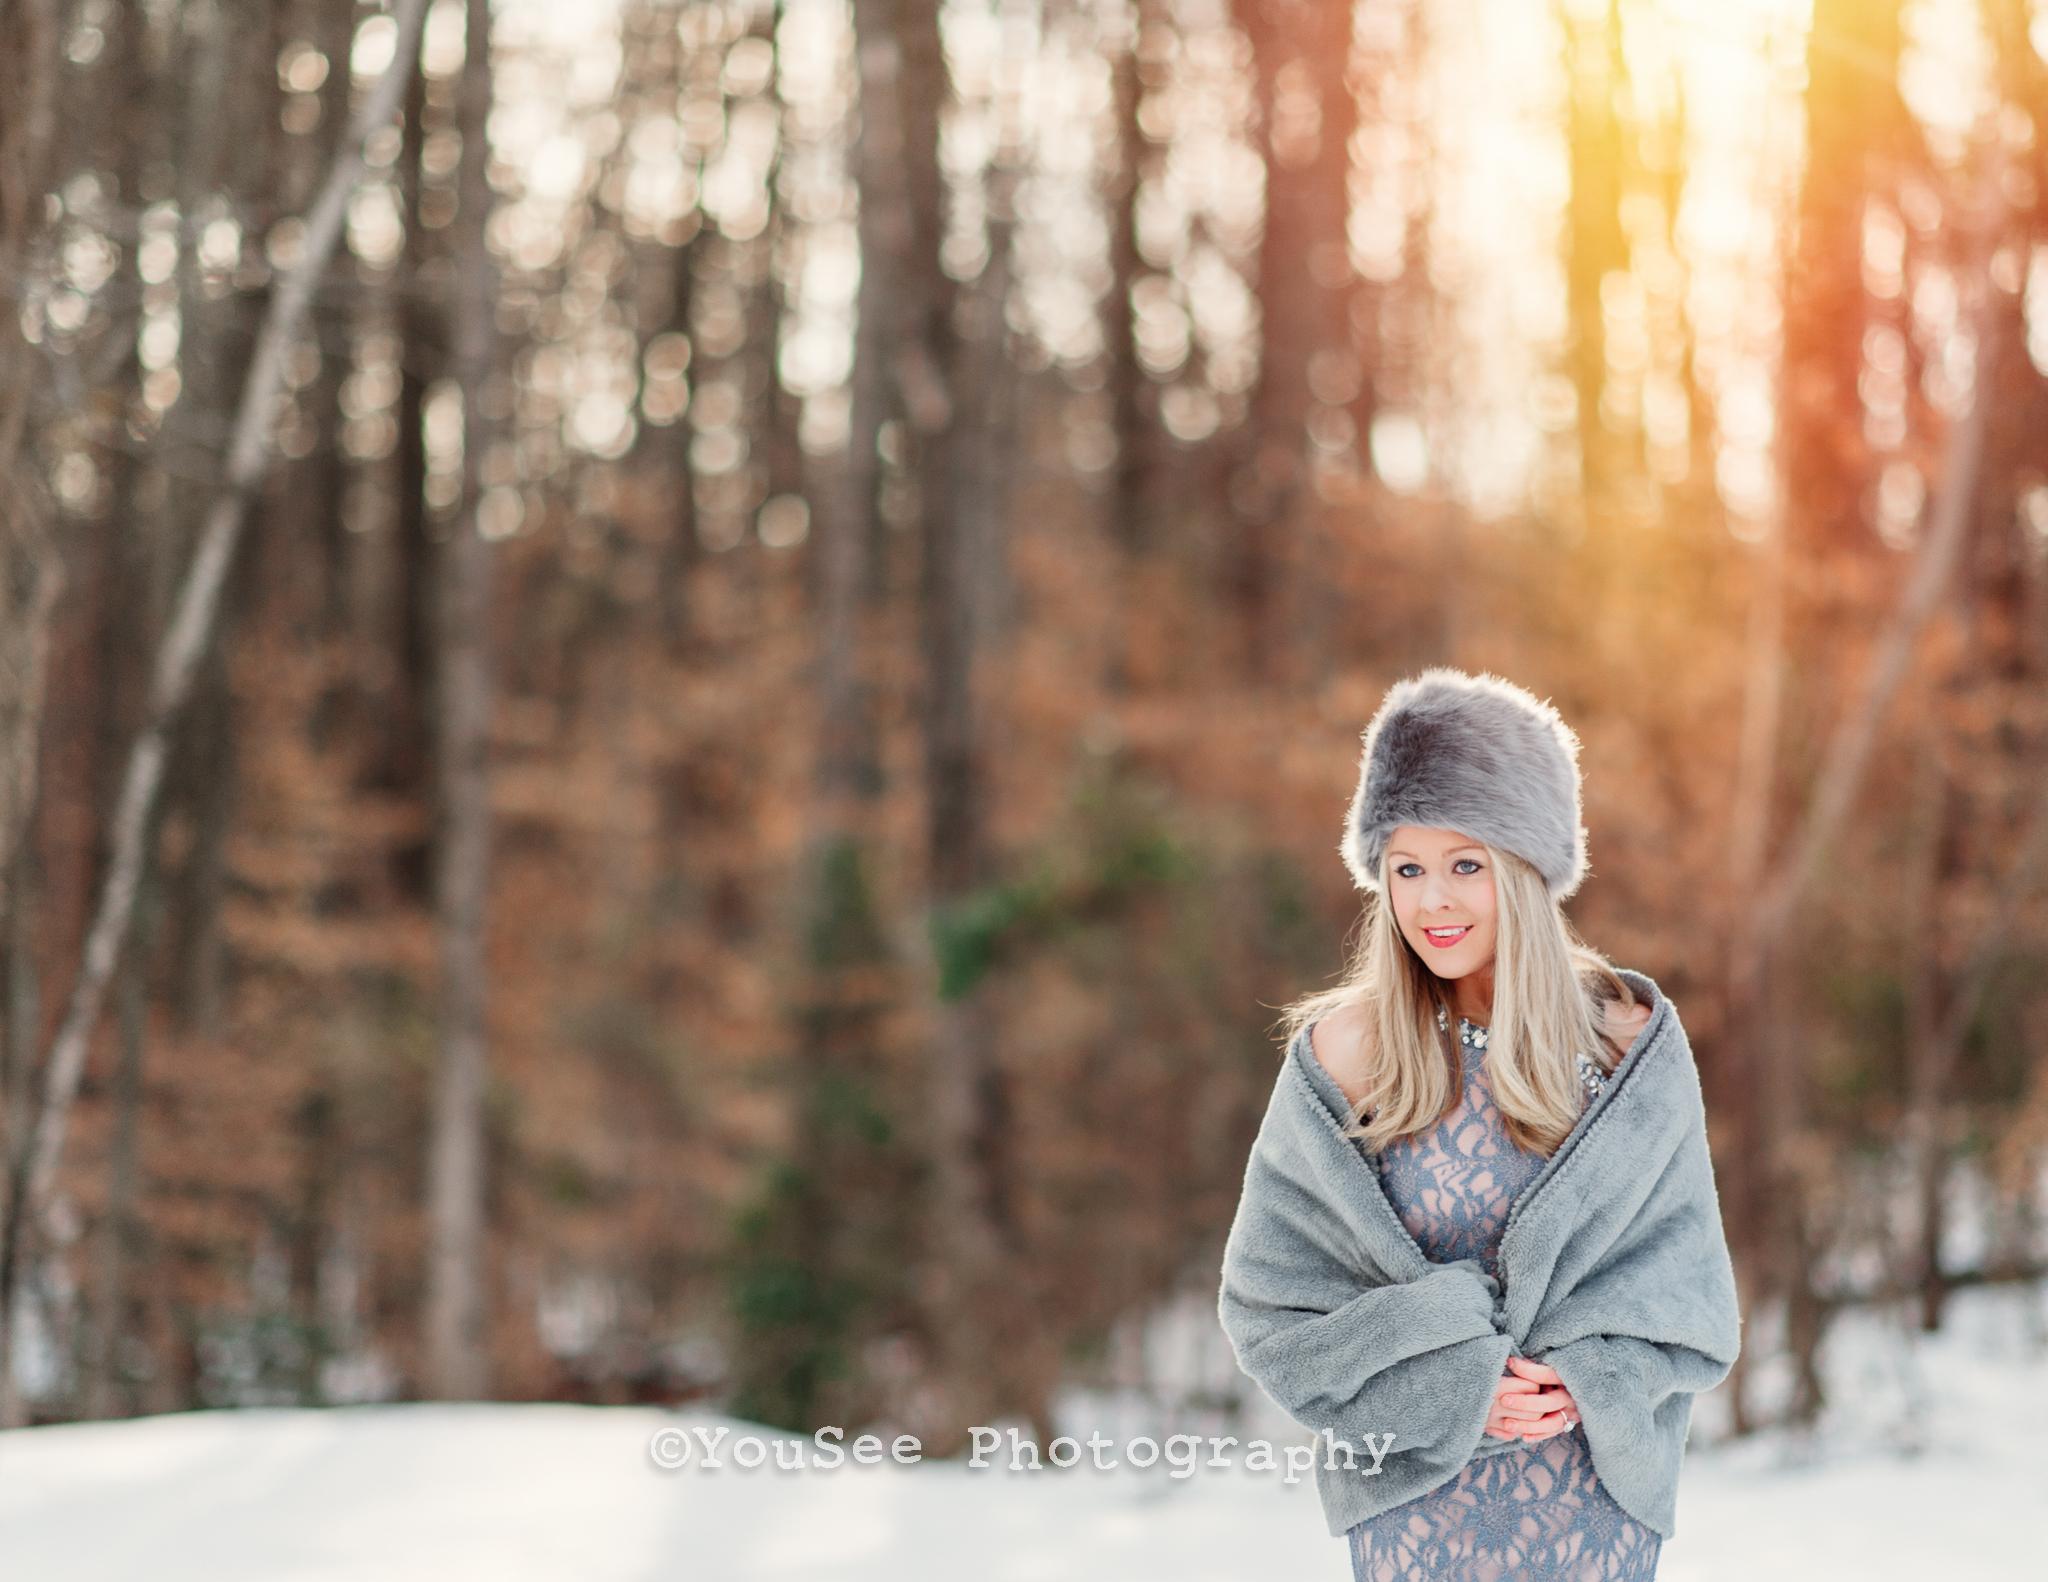 seniorportrait_fredericksburg_photography_winter2 (4)